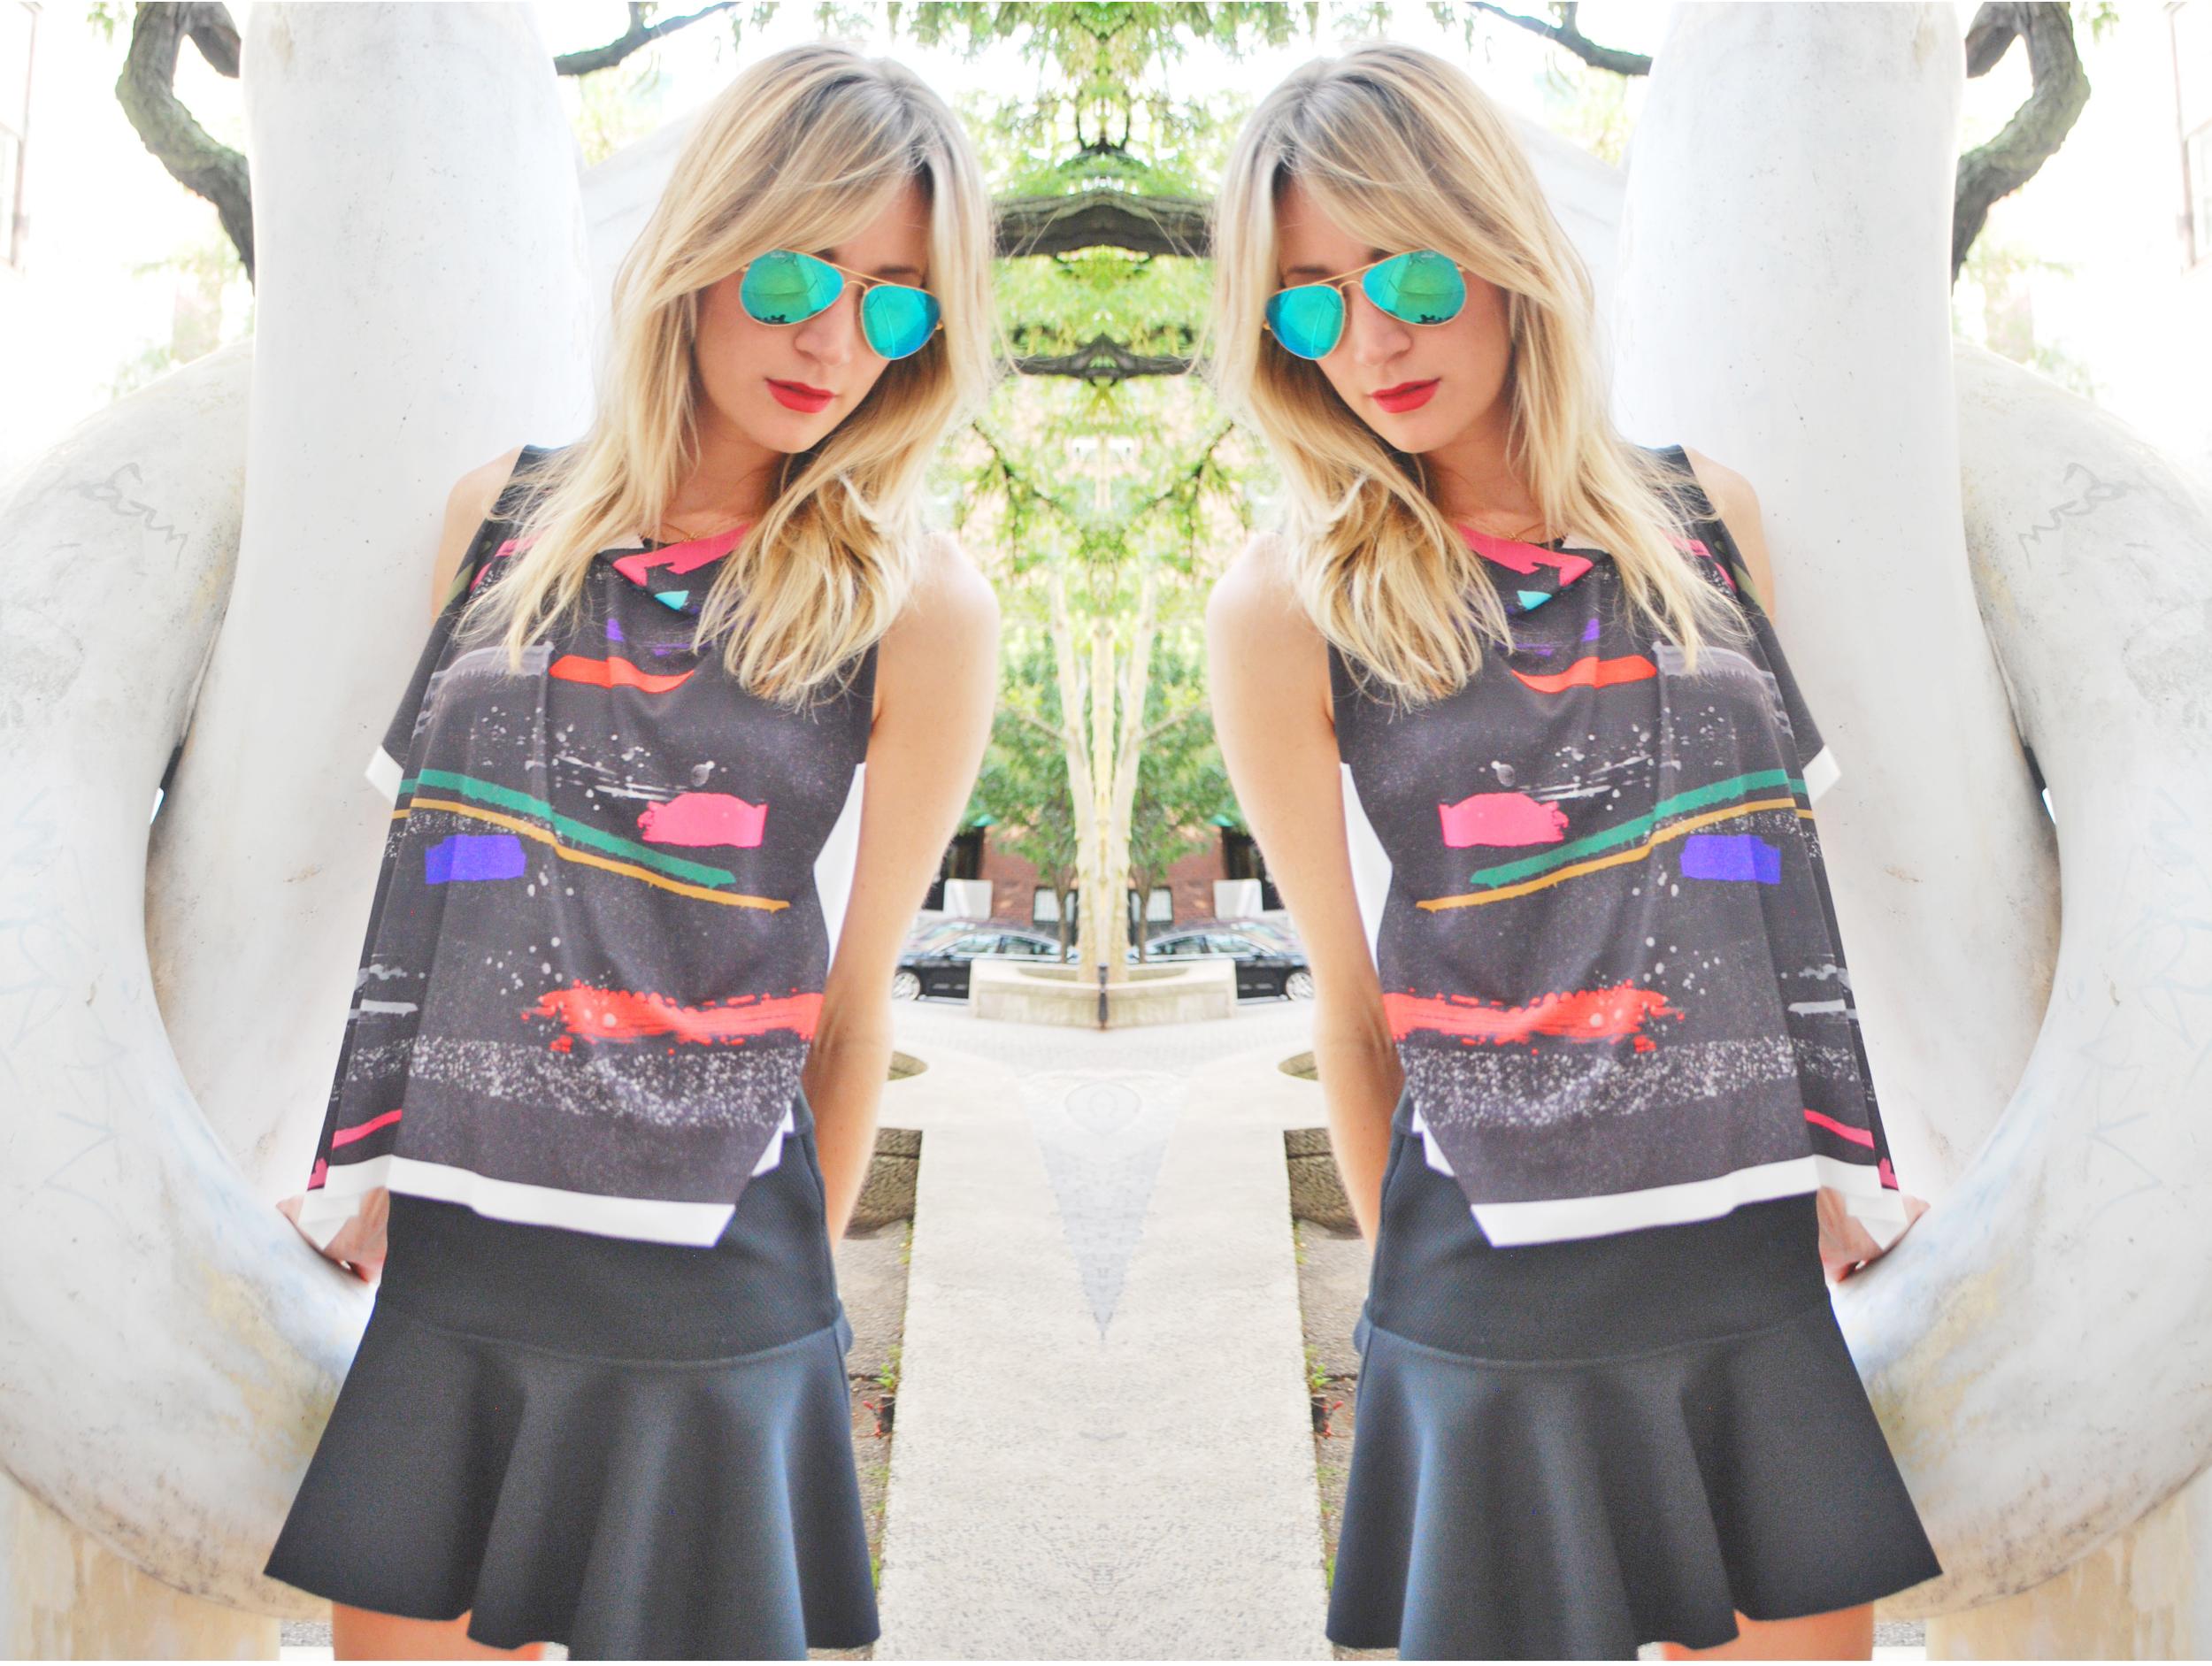 Top, Zara (sale); Skirt, H&M ( similar here ); Sandals, Zara (sale); Sunnies,  Ray-Ban ; Lipstick,  Mac